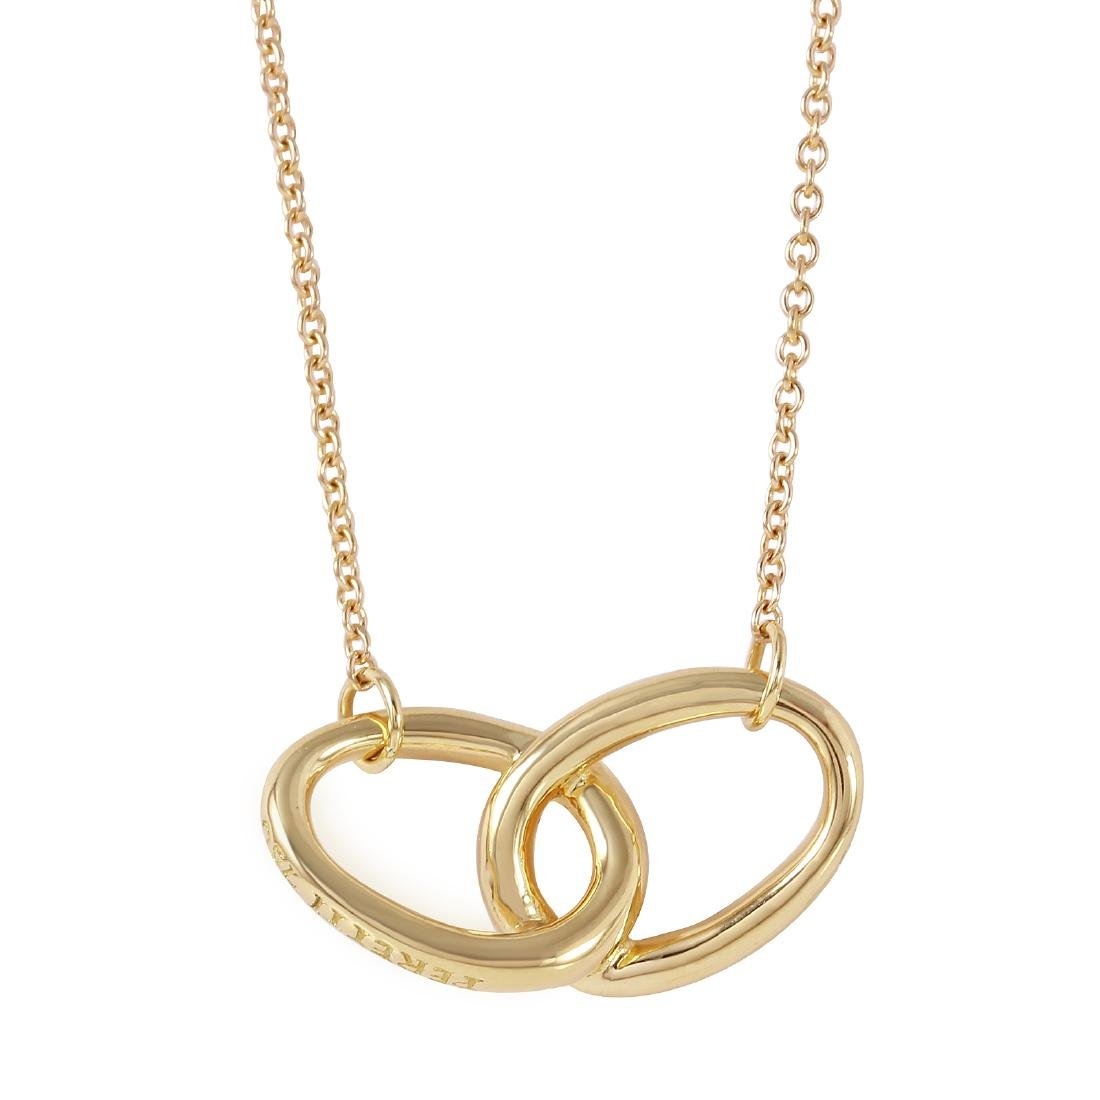 ELSA PERETTI TIFFANY CO. 18KT Gold Necklace Length